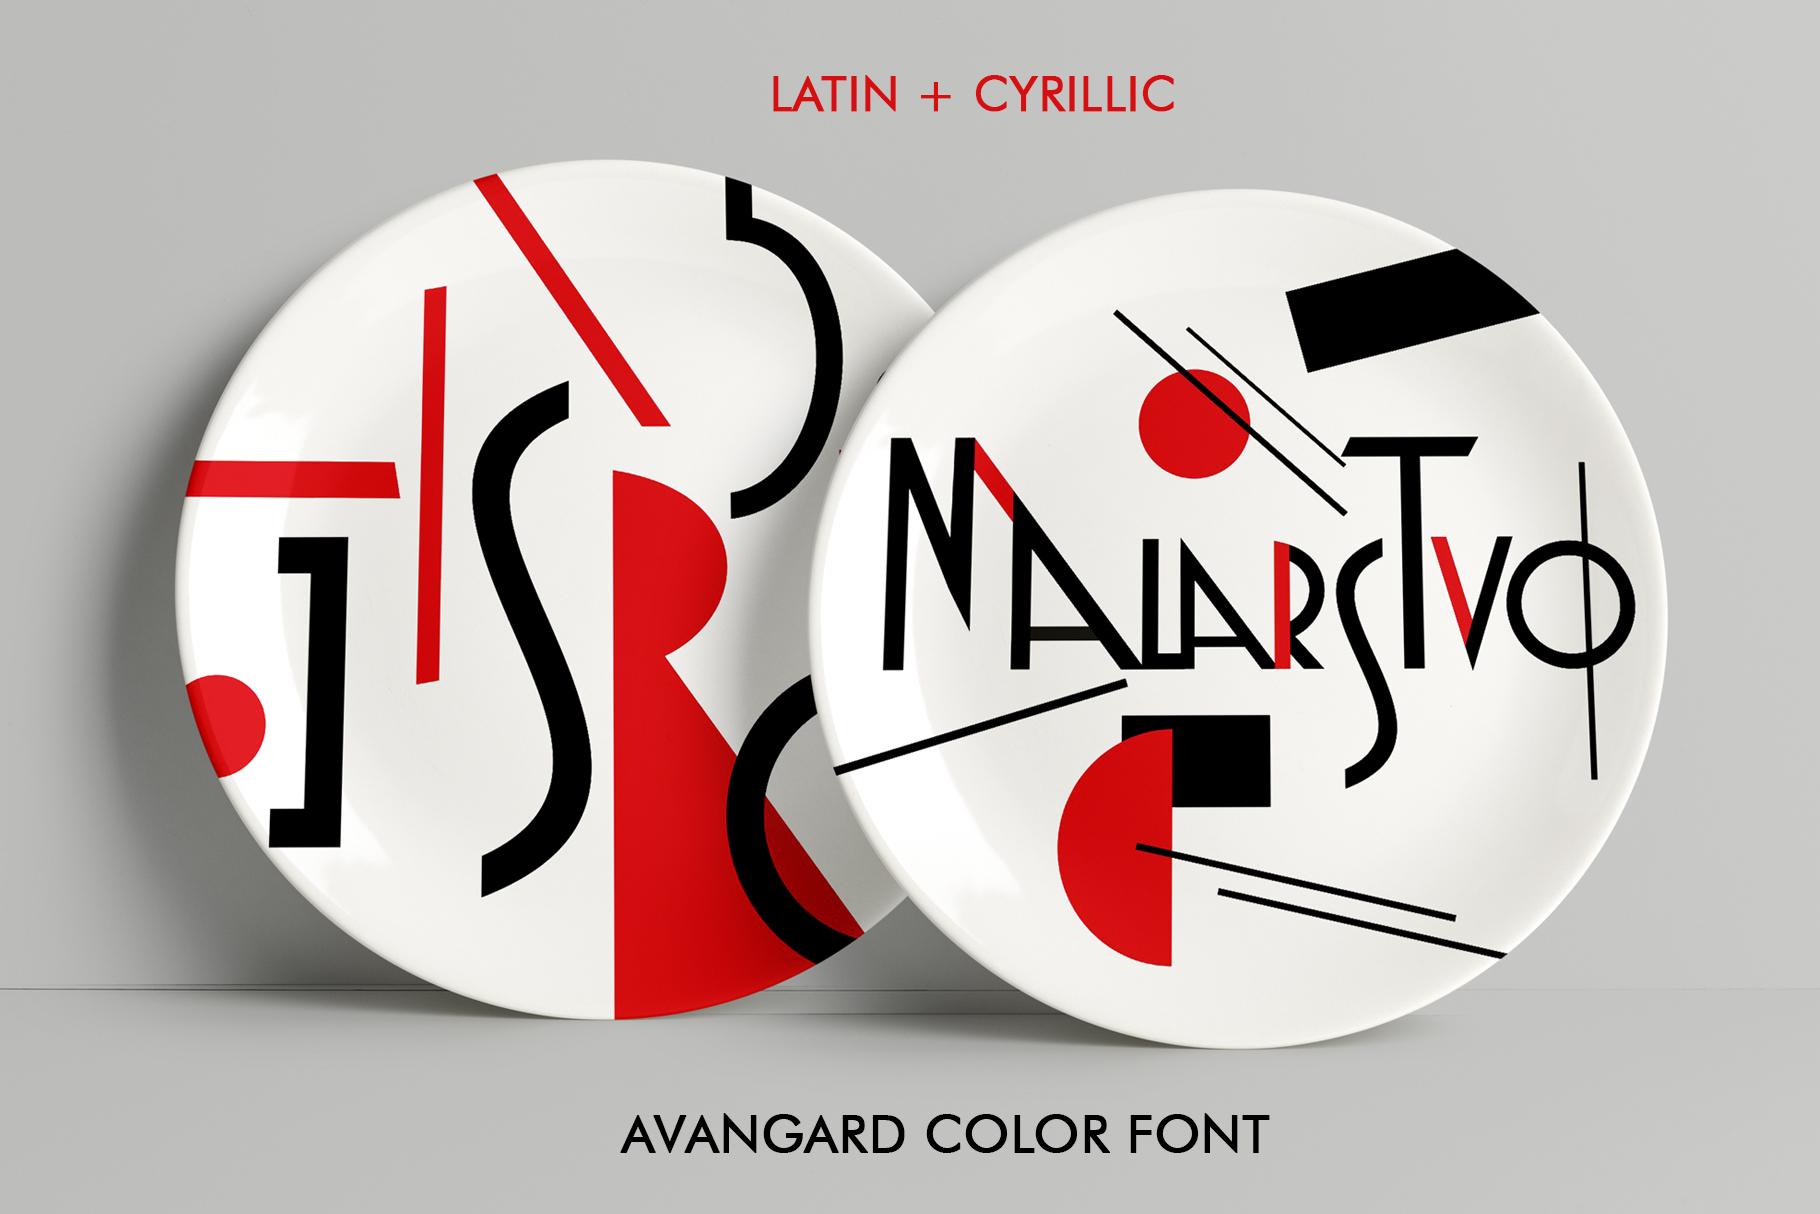 Malarstvo avangard color font example image 1